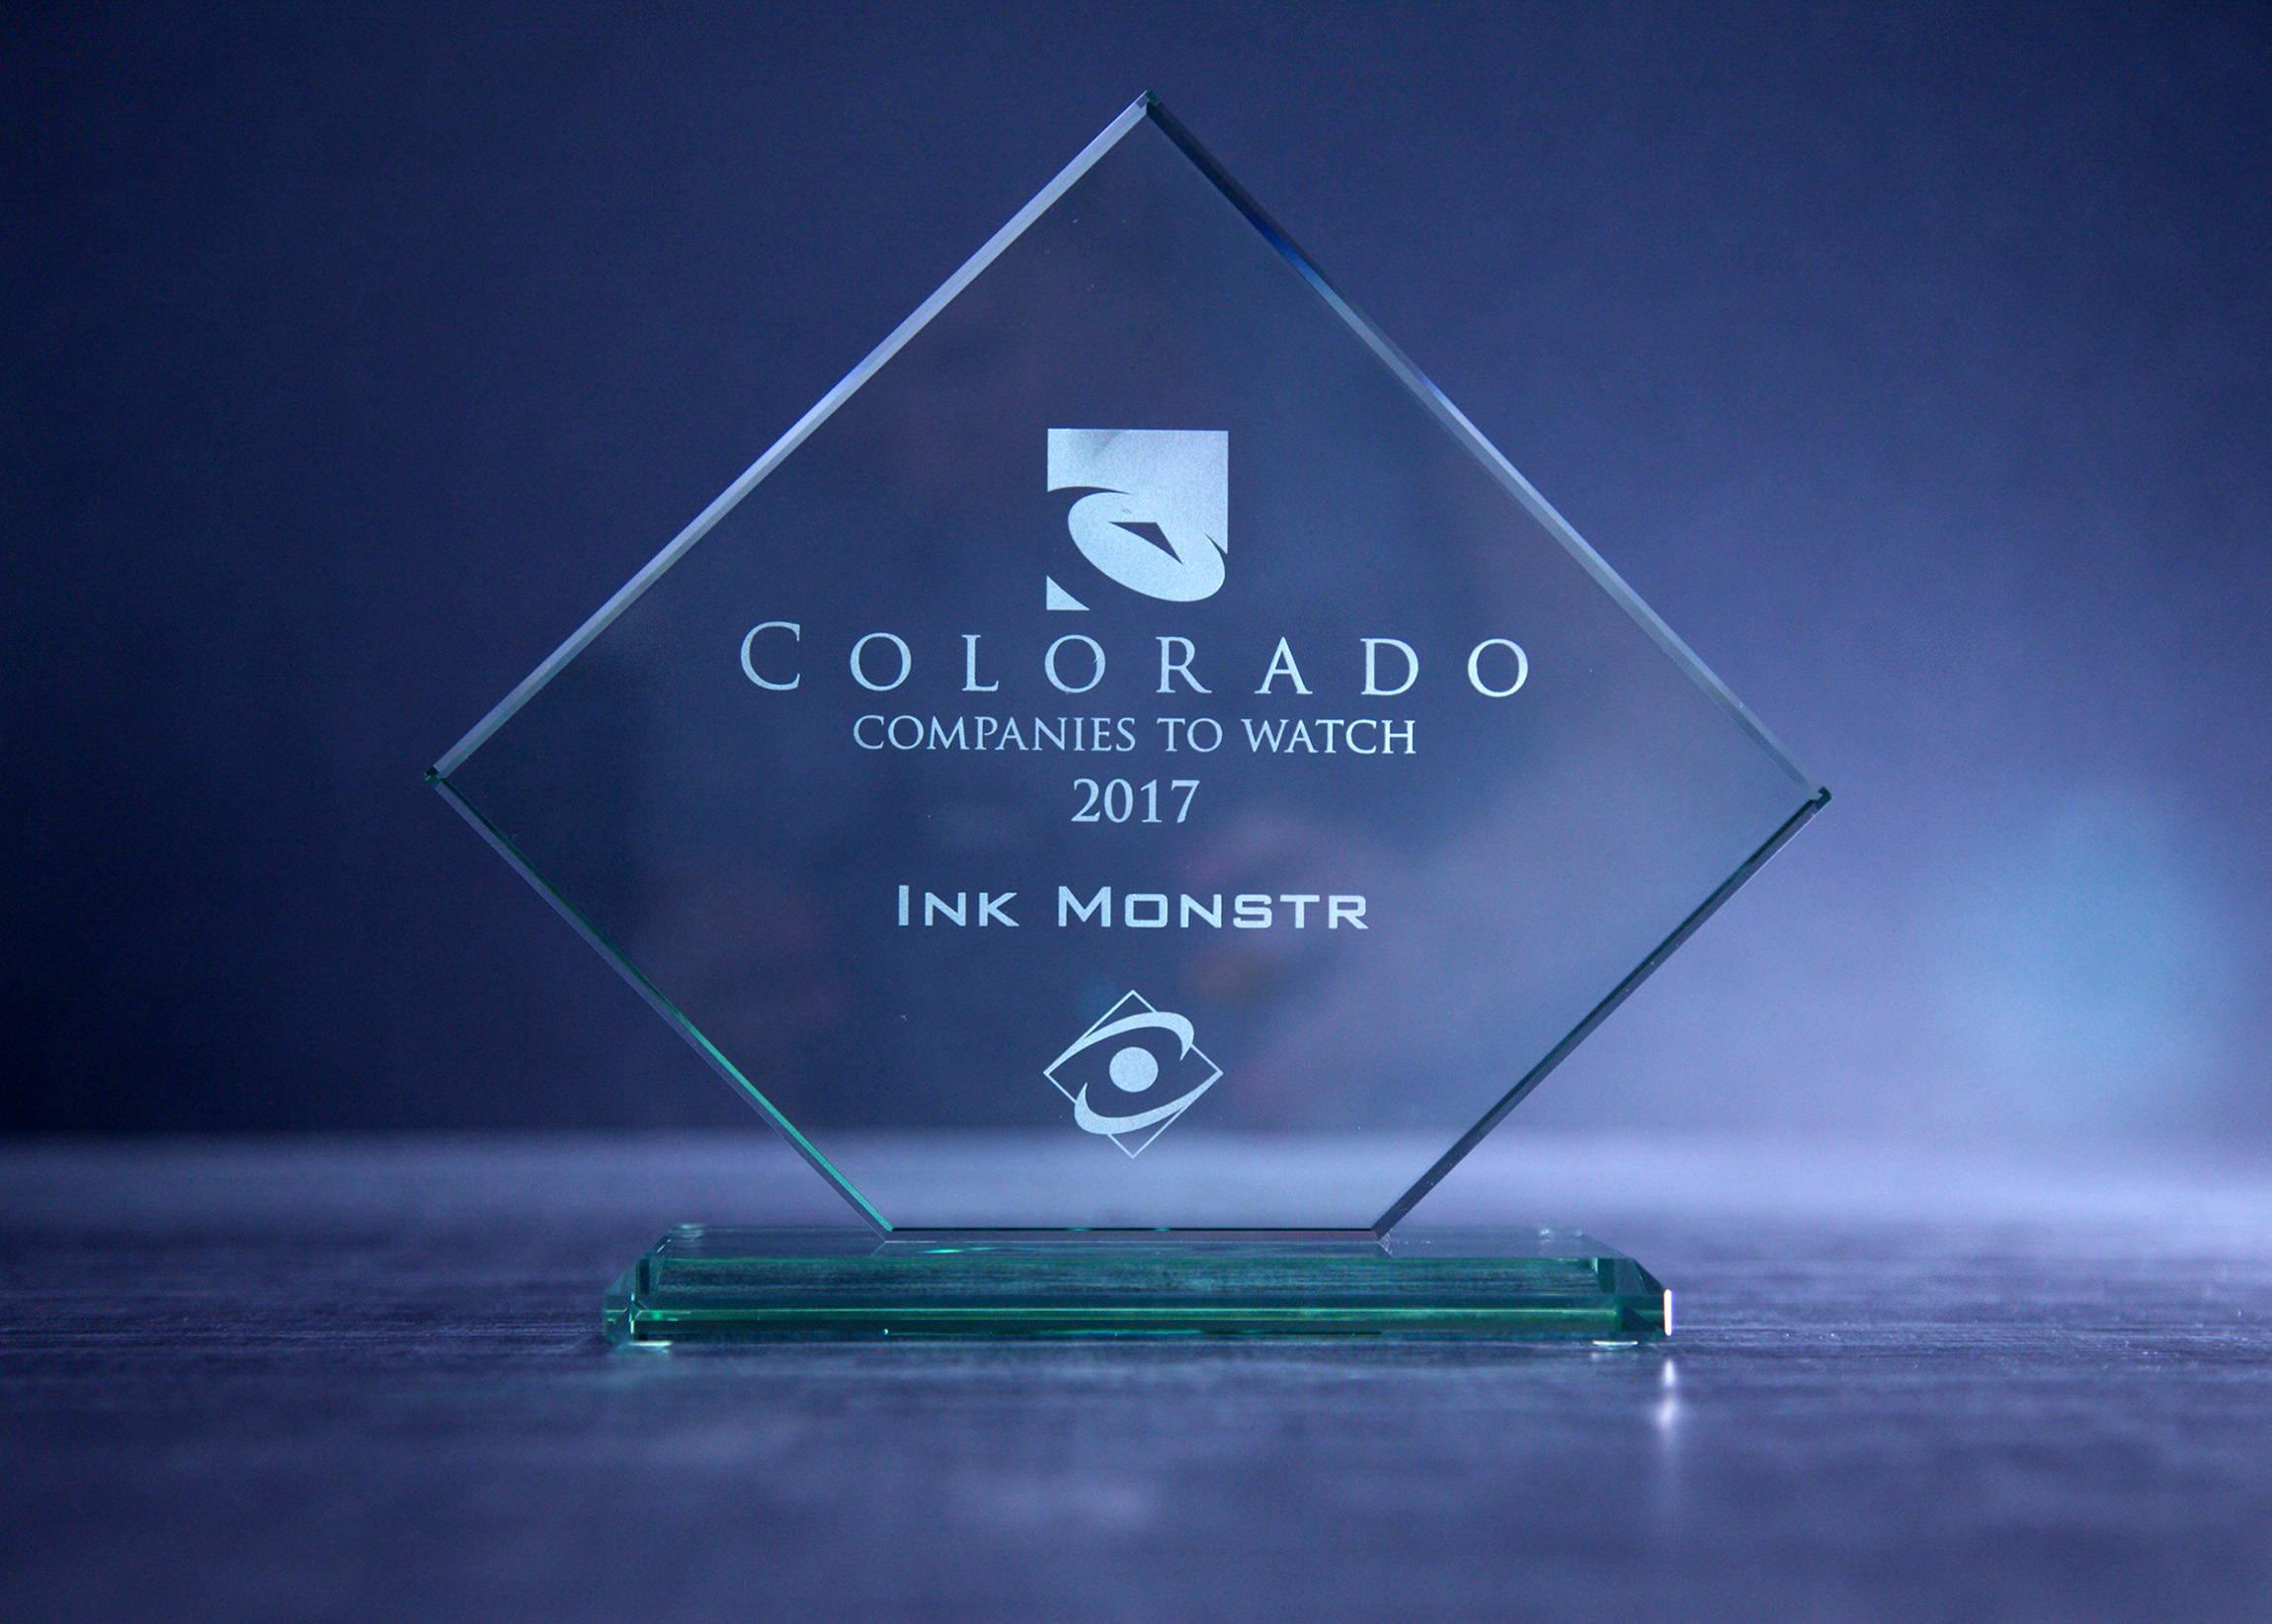 Colorado Company to Watch Award 2017 - Ink Monstr